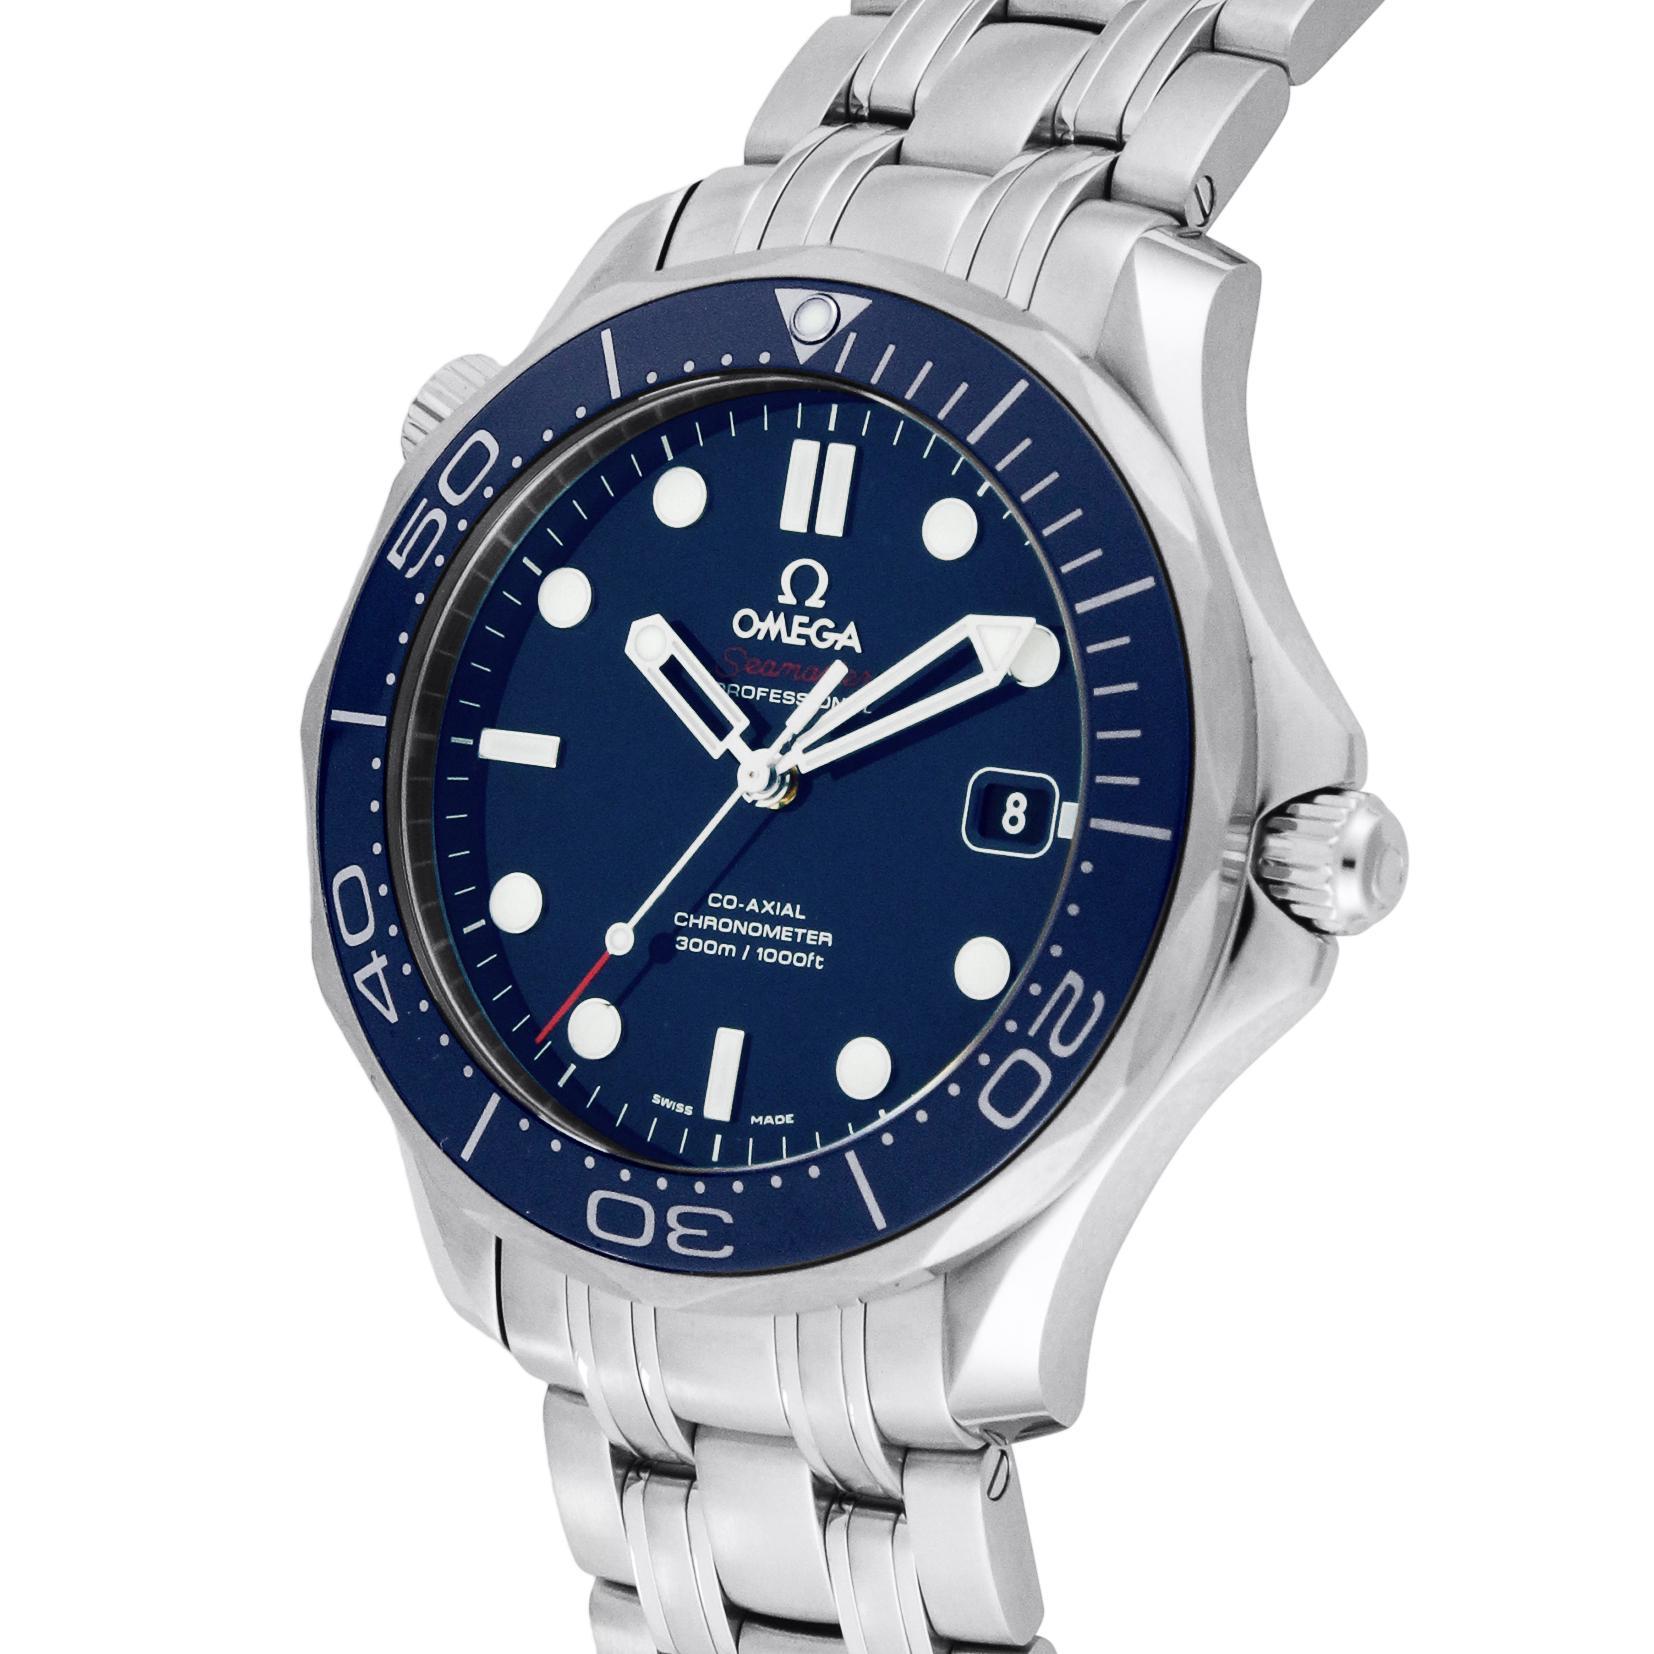 new style f119e d4972 [オメガ]OMEGA 腕時計 シーマスター ブルー文字盤 コーアクシャル自動巻 300M防水 クロノメーター 212.30.41.20.03.001  メンズ 【並行輸入品】